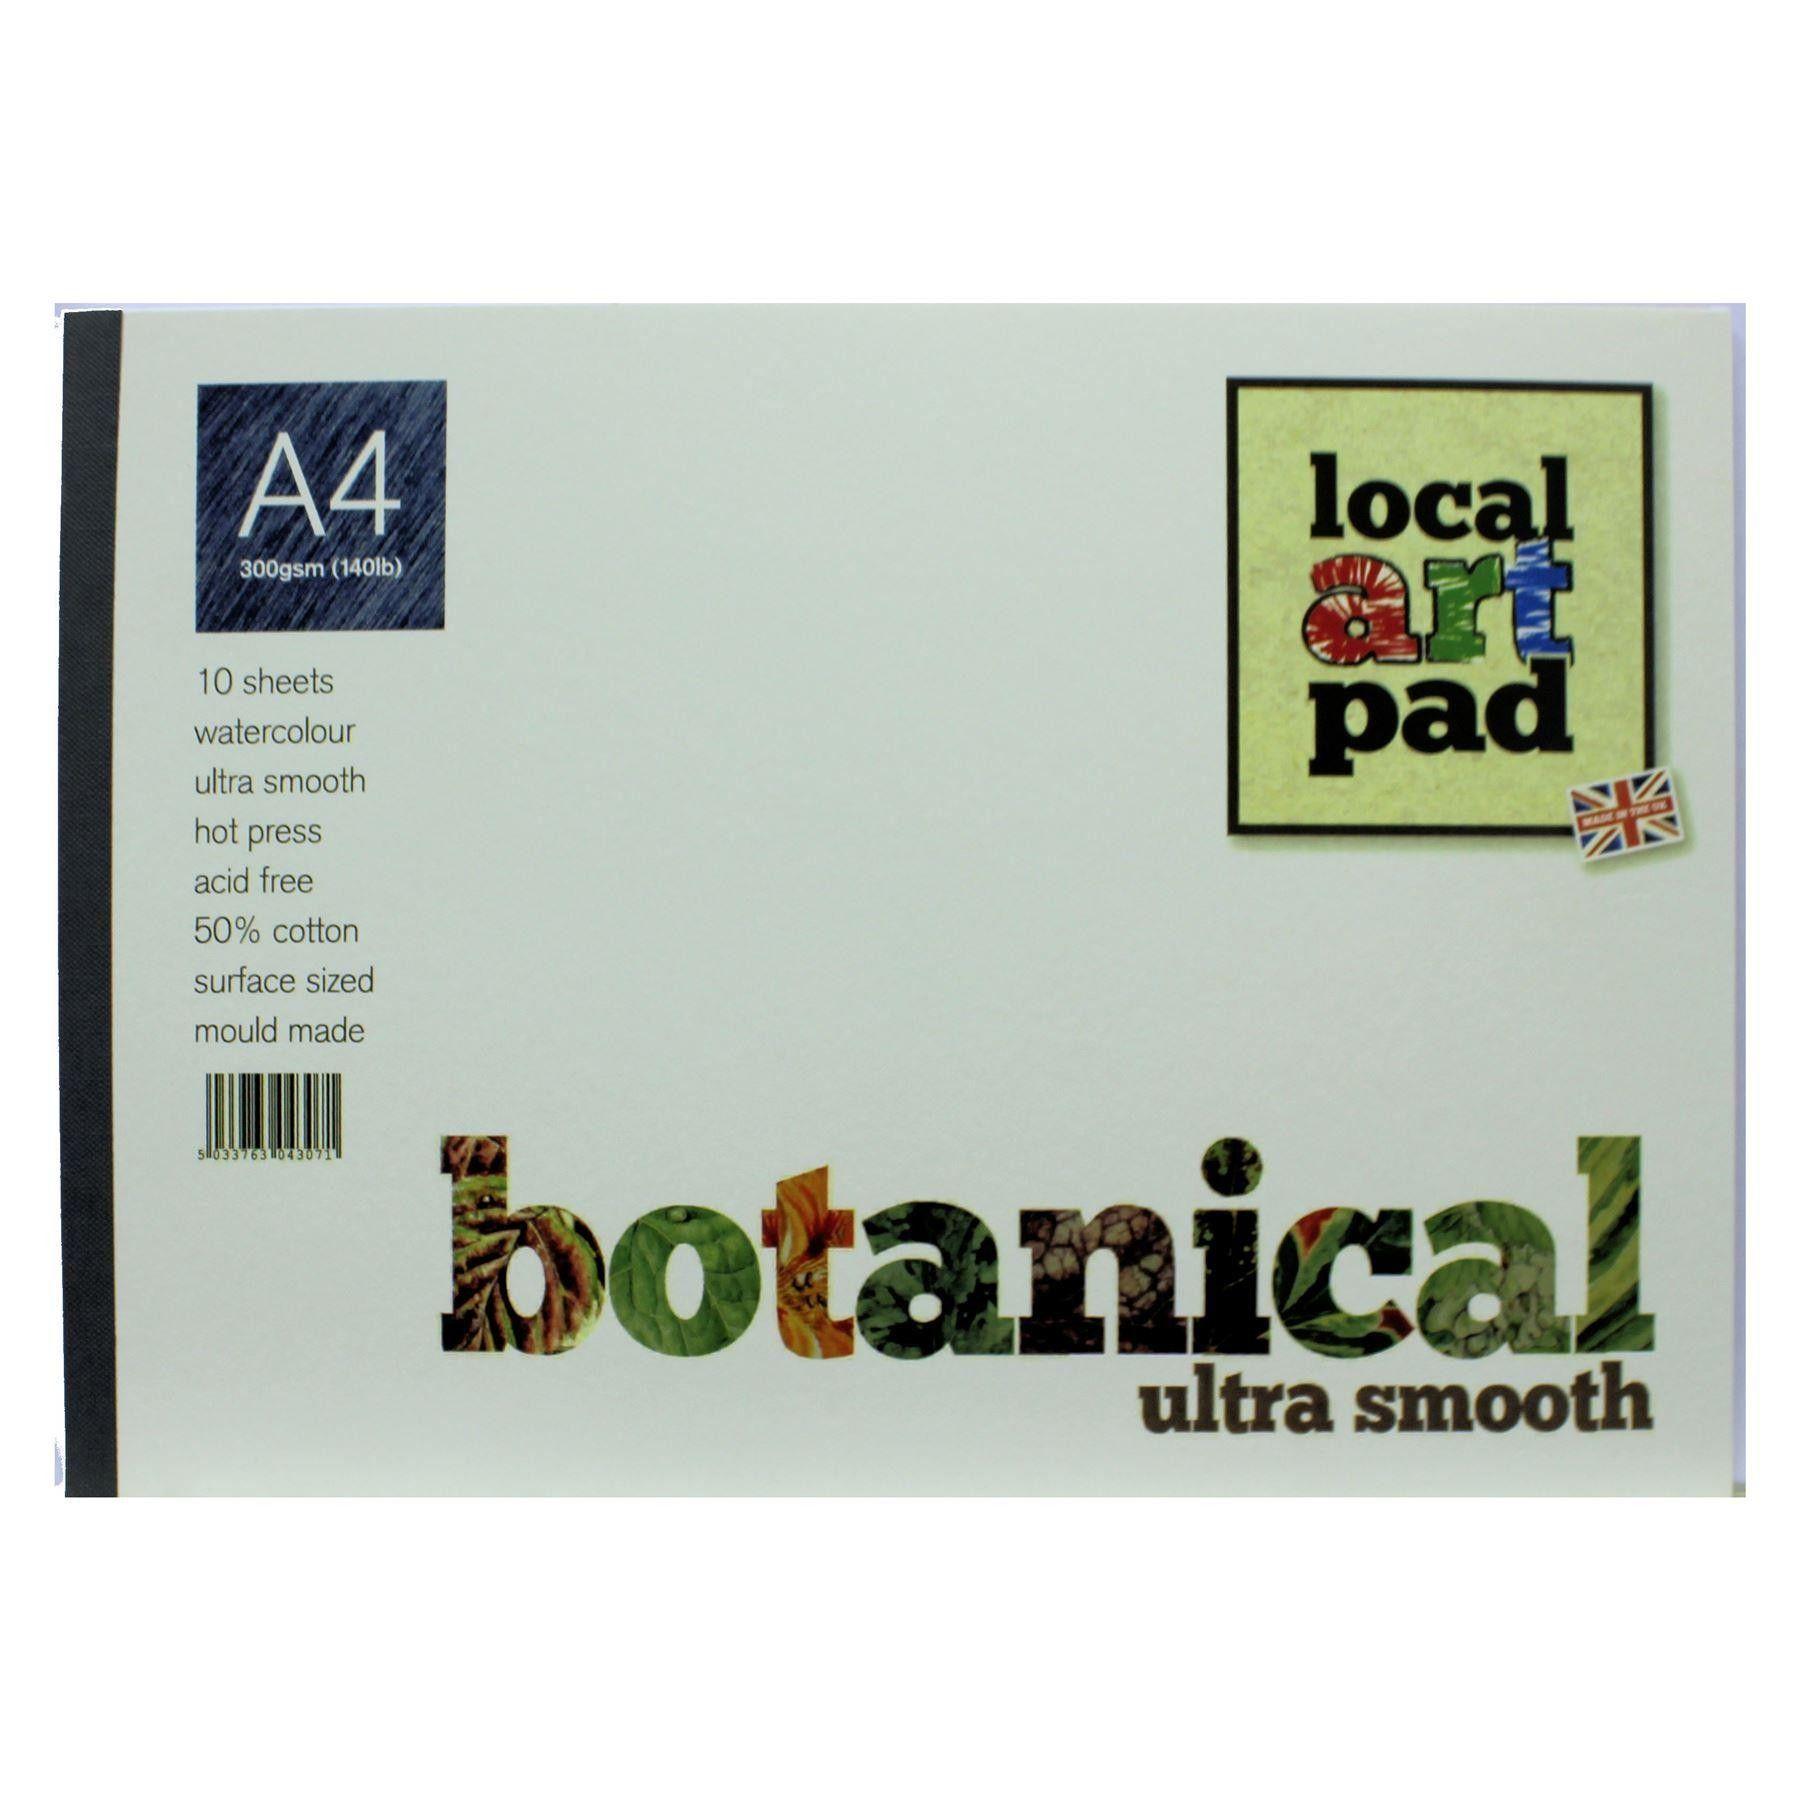 Local Art Pad A4 Botanical Hot Press Watercolour Paper 300gsm 50